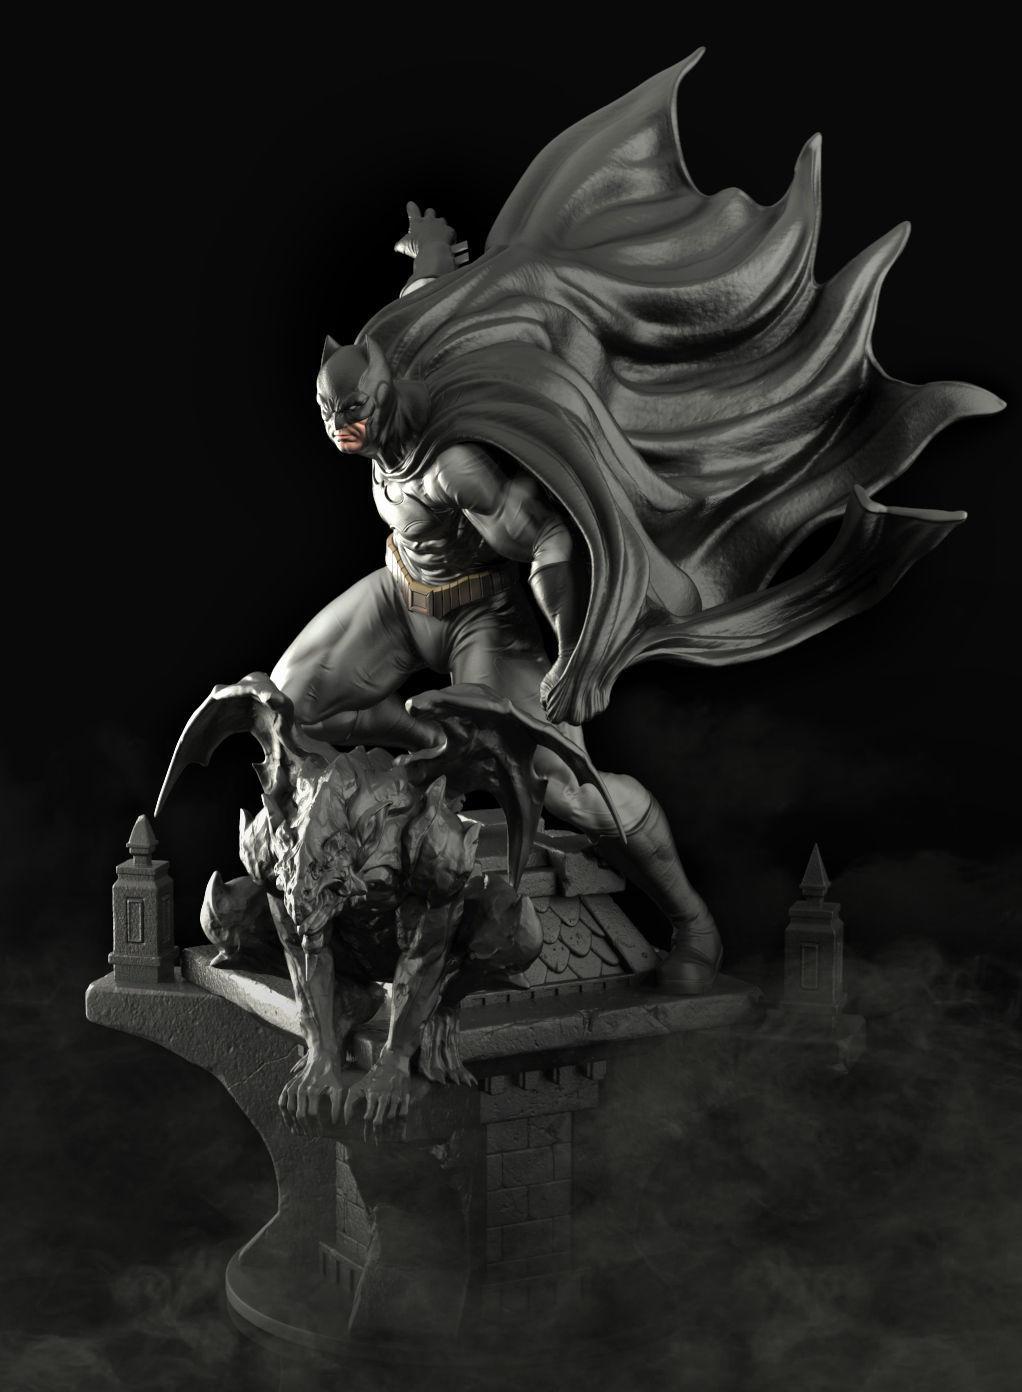 Batman Figure - Ready to print